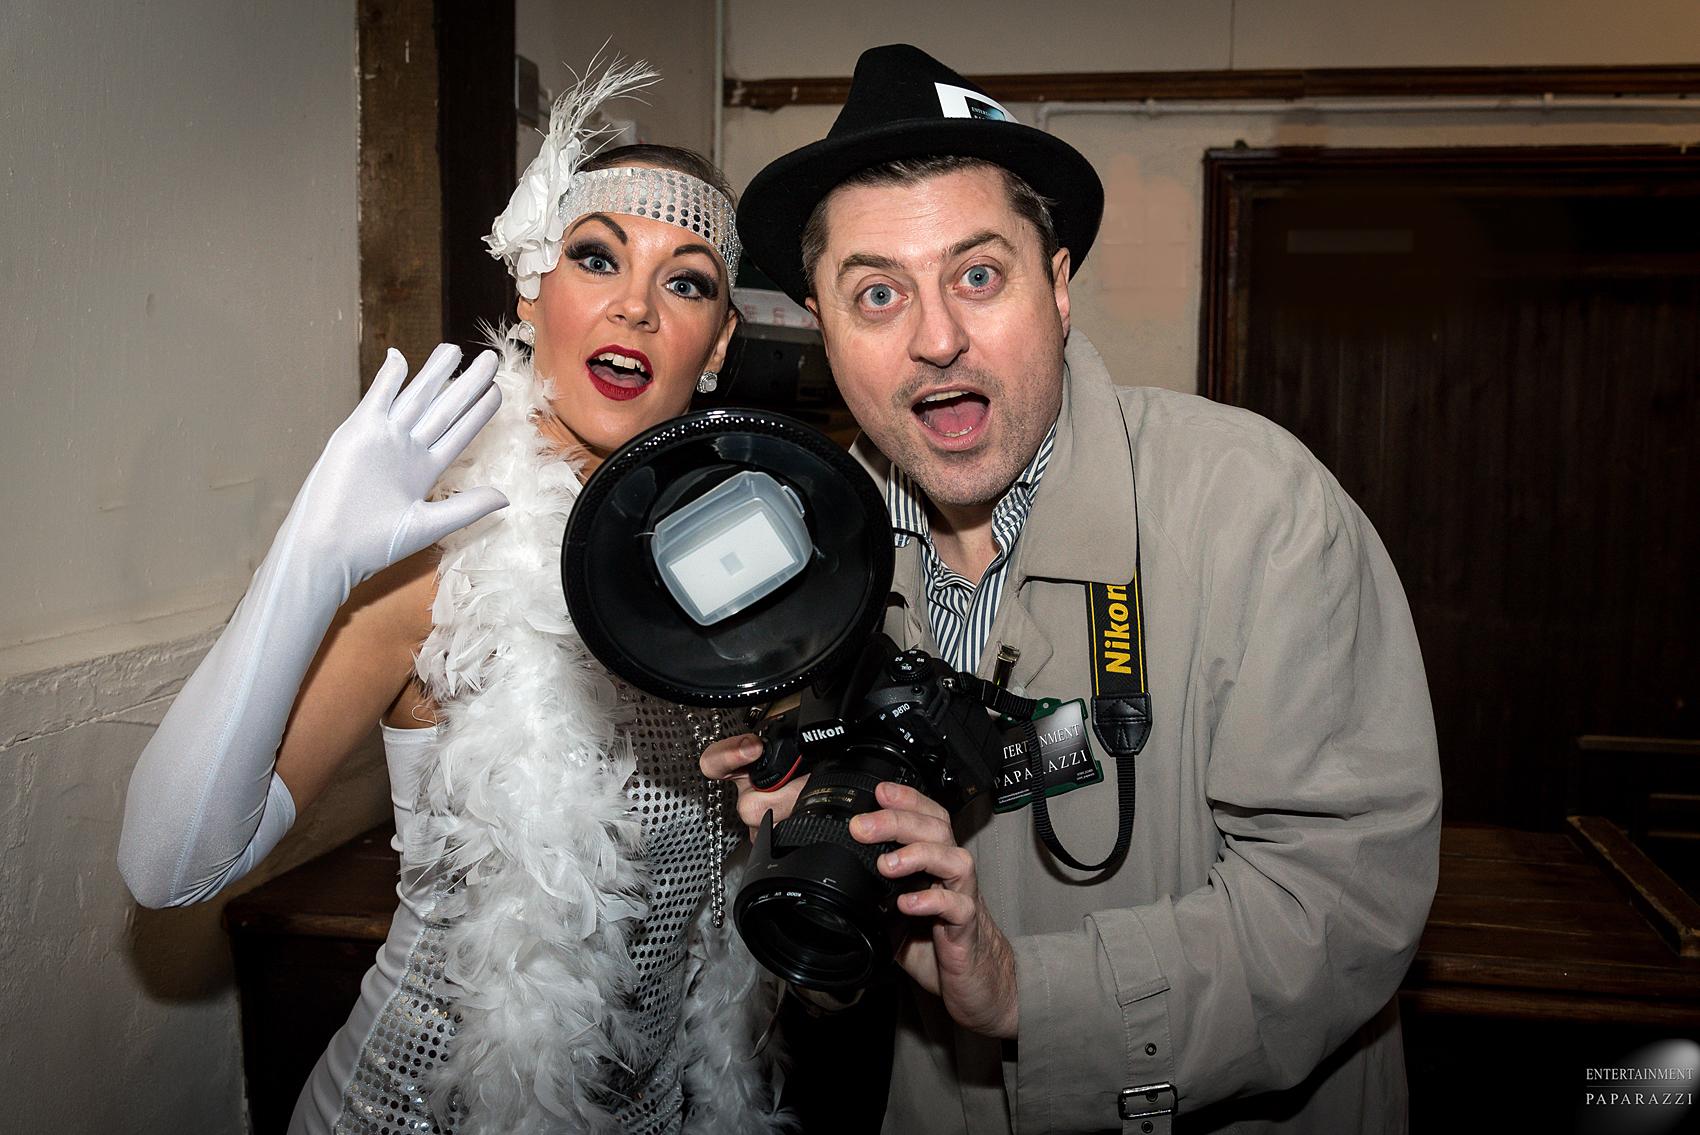 Paparazzi Entertainers